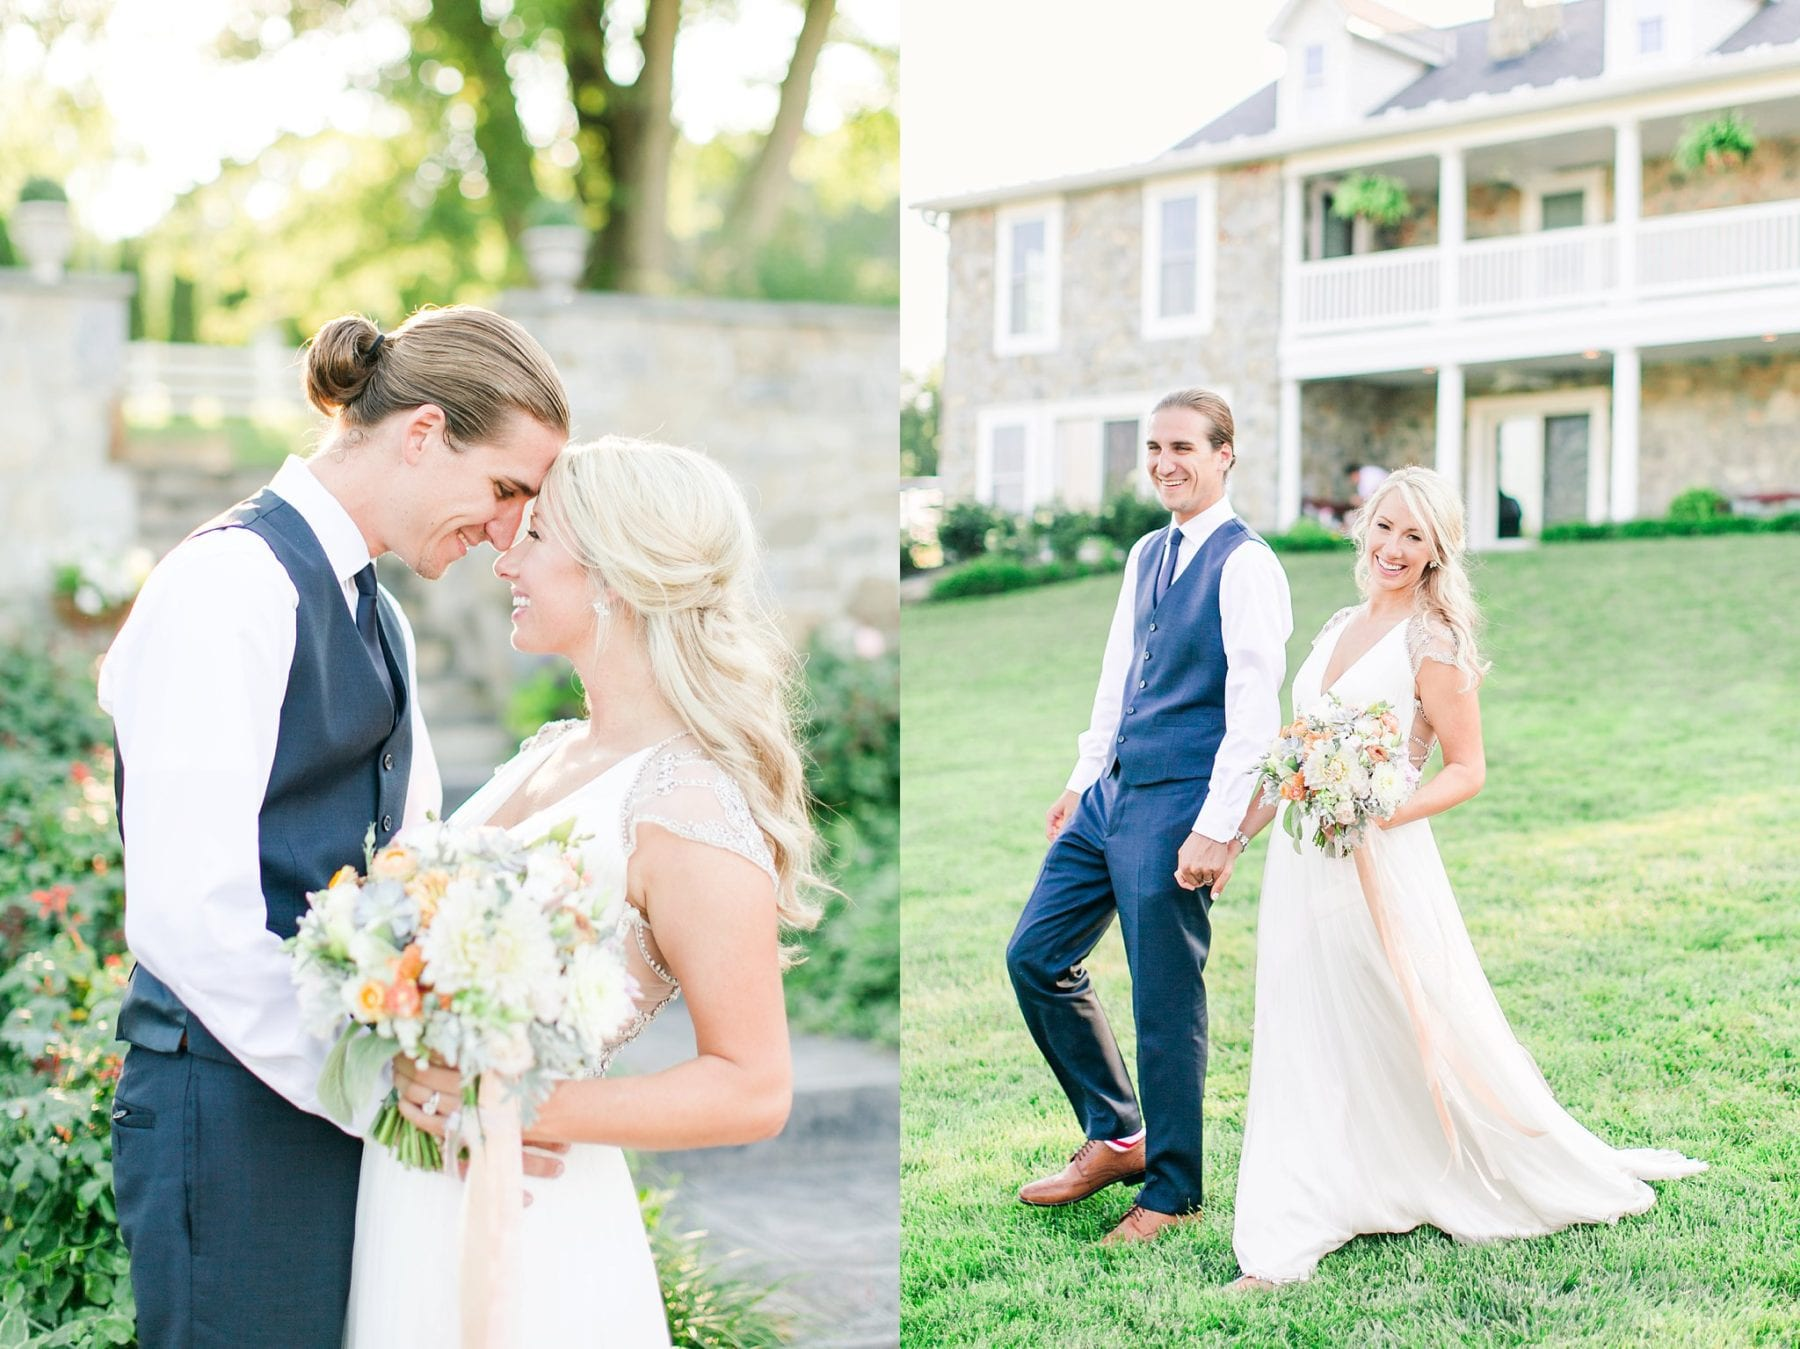 Pond View Farm Wedding Photos Maryland Wedding Photographer Kristen & Ryan Megan Kelsey Photography Blog-230.jpg